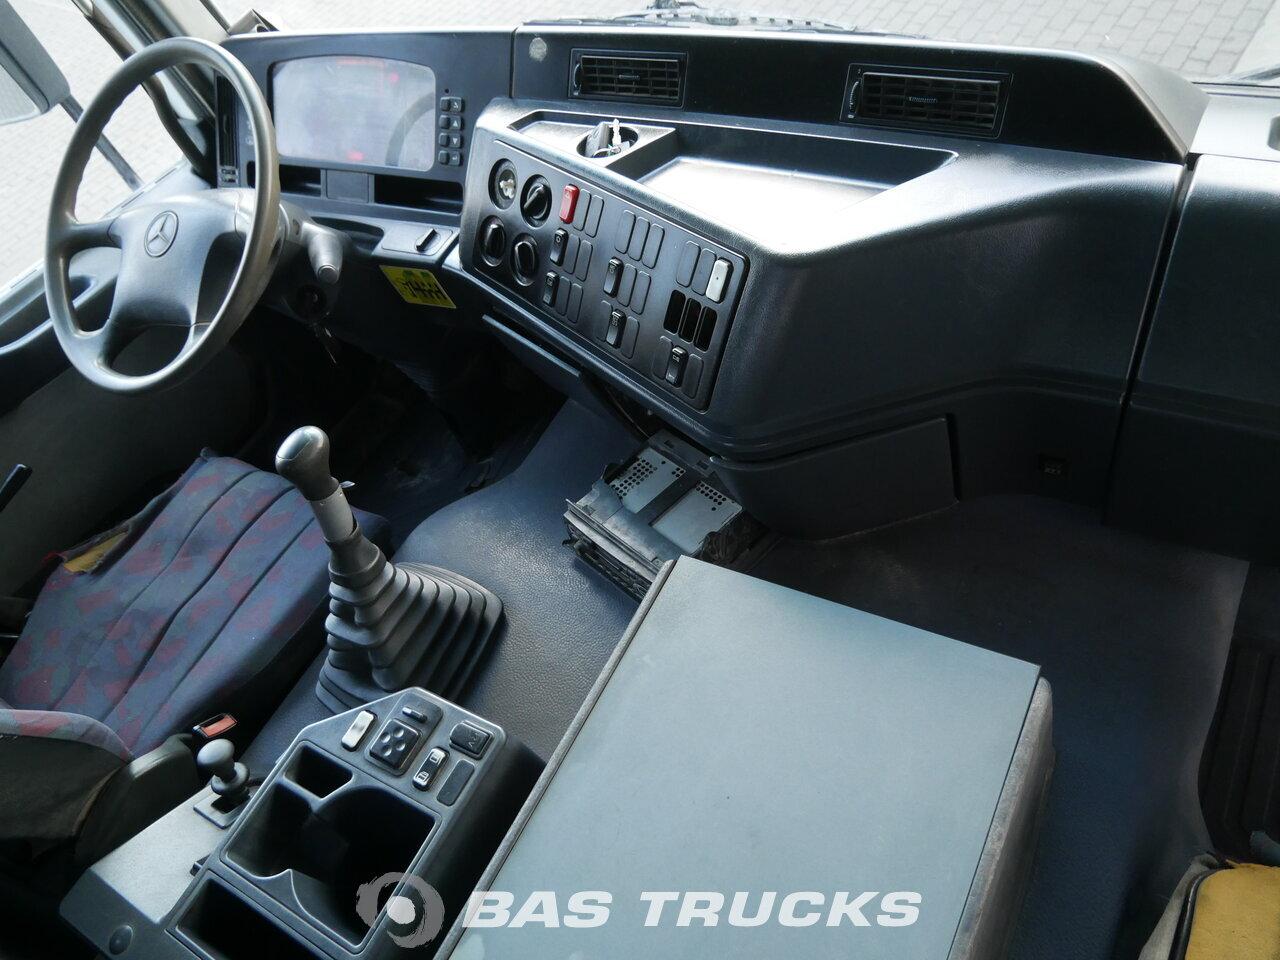 foto di Usato Motrice Mercedes Actros 3331 B 6X4 2001